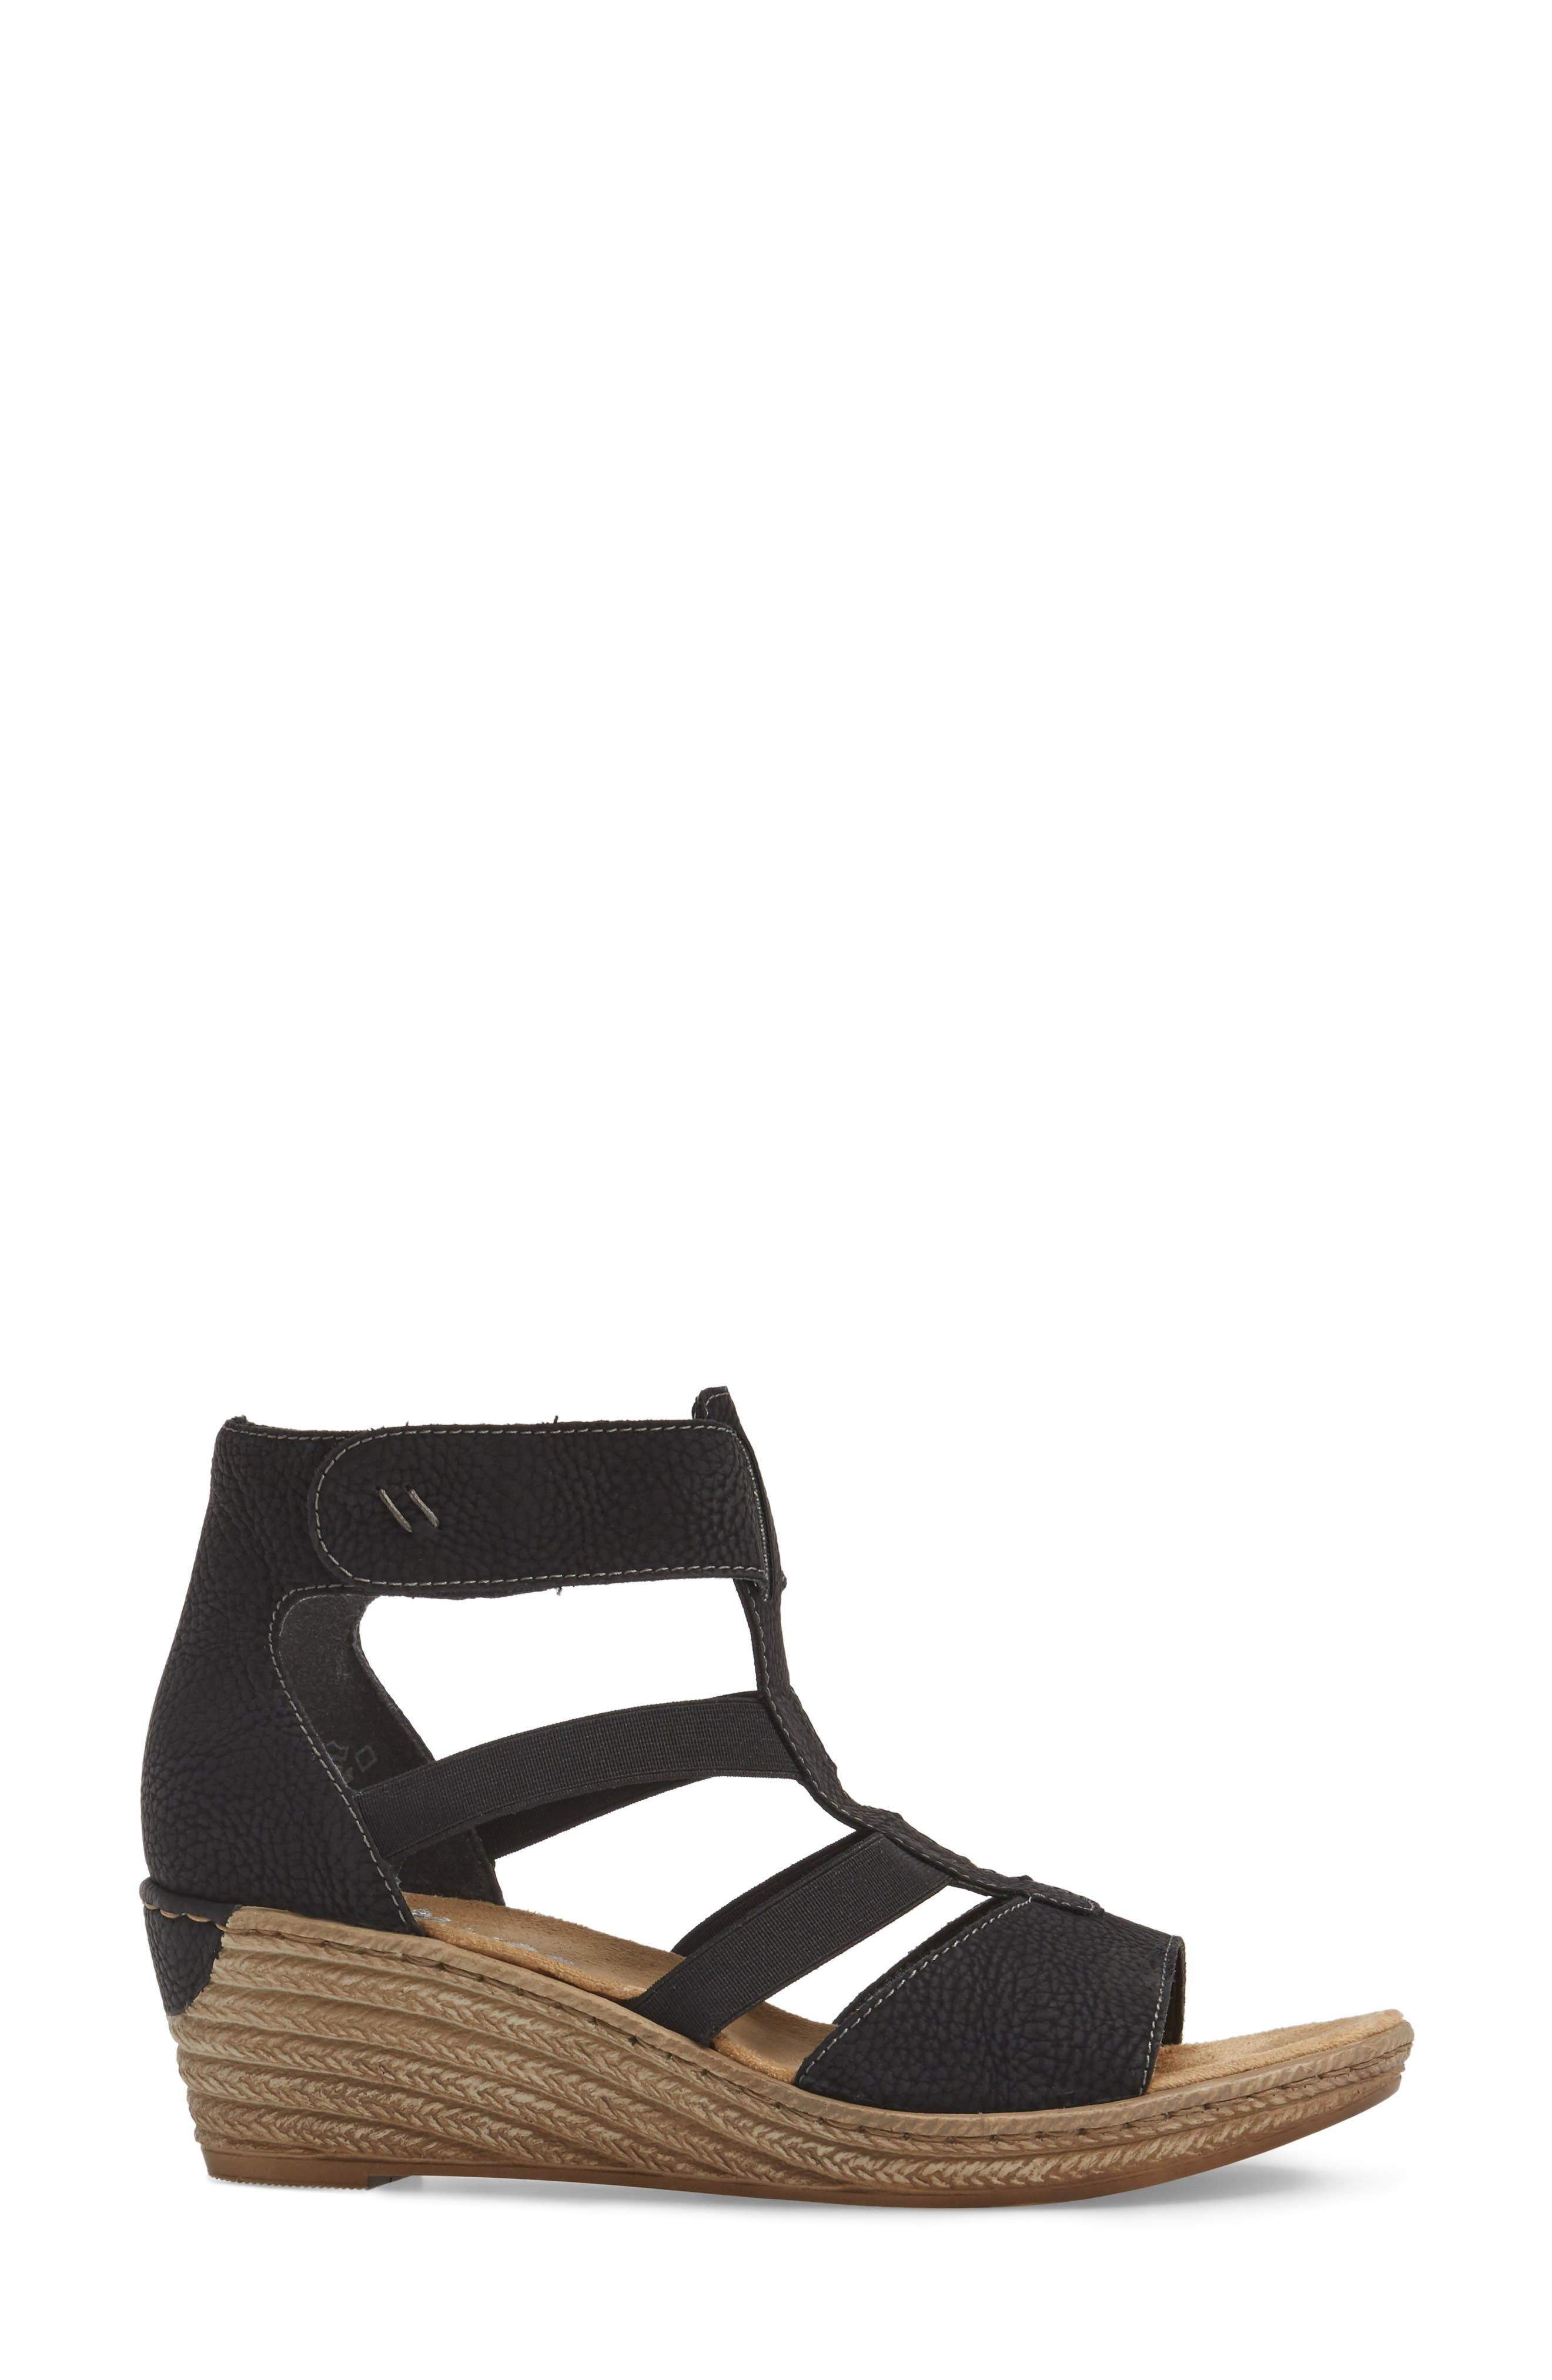 Alternate Image 3  - Rieker Antistress Fanni 39 Wedge Sandal (Women)